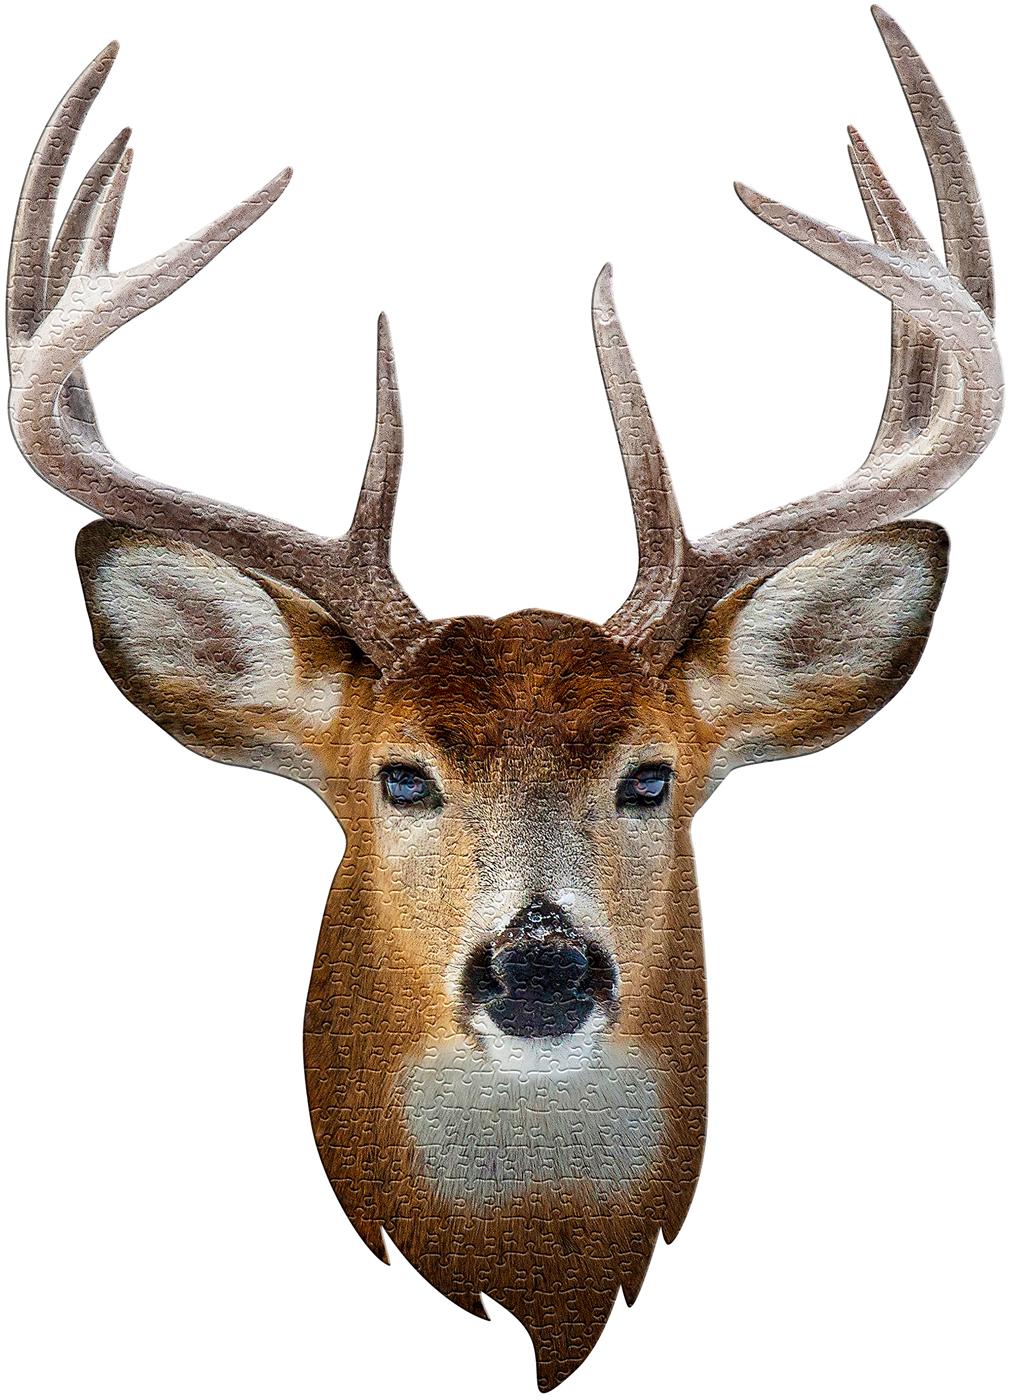 Madd Capp Mini Puzzle - I AM Buck Animals Shaped Puzzle